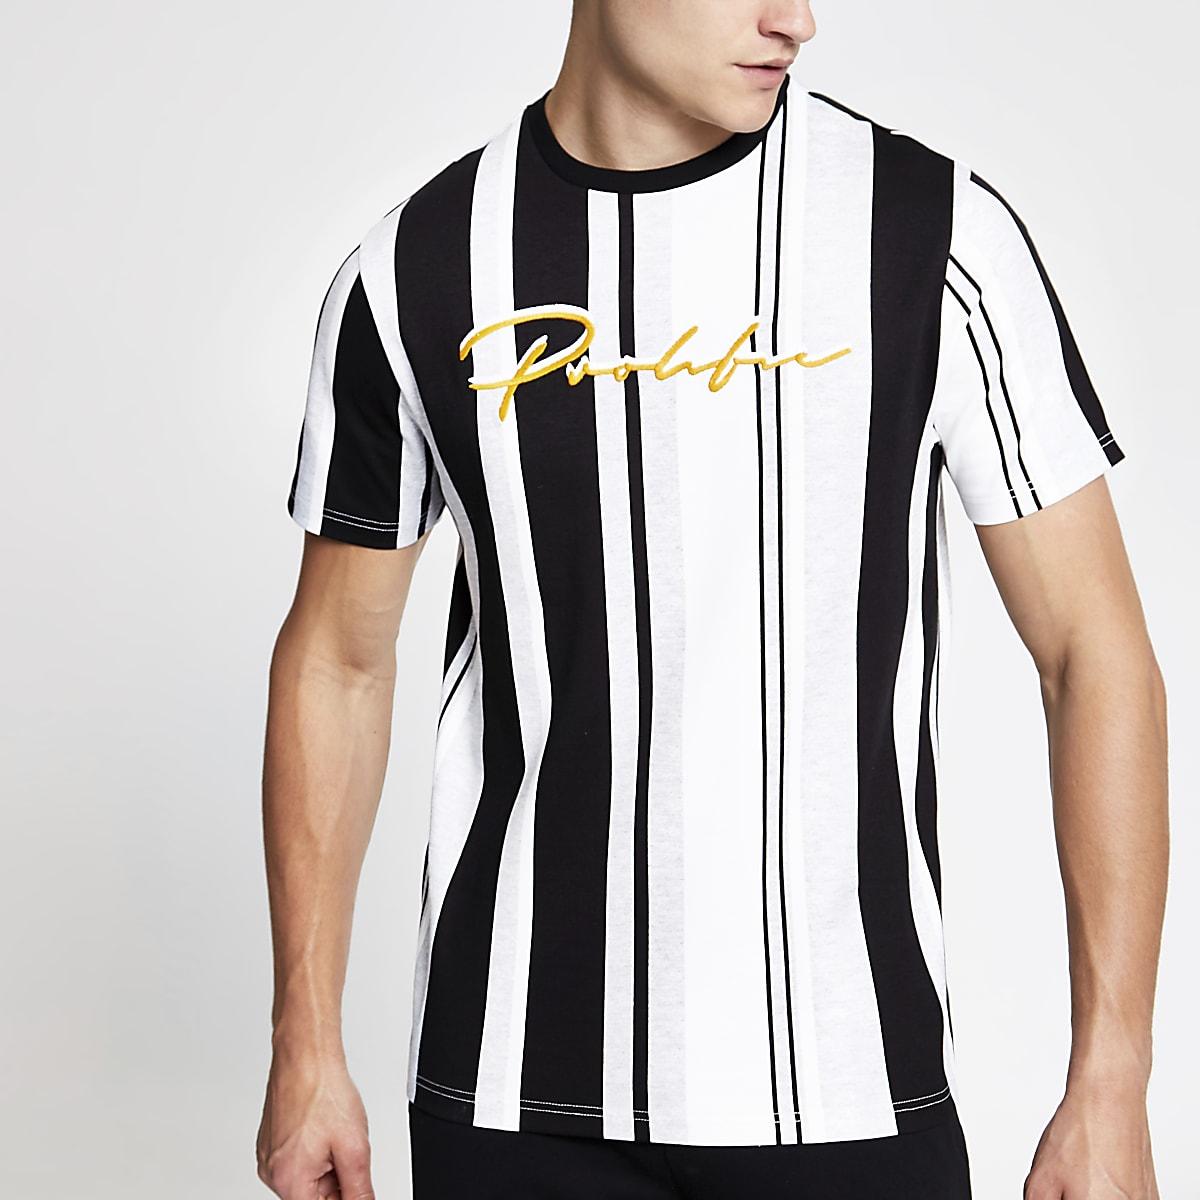 Zwart gestreept slim-fit T-shirt met 'Prolific'-print